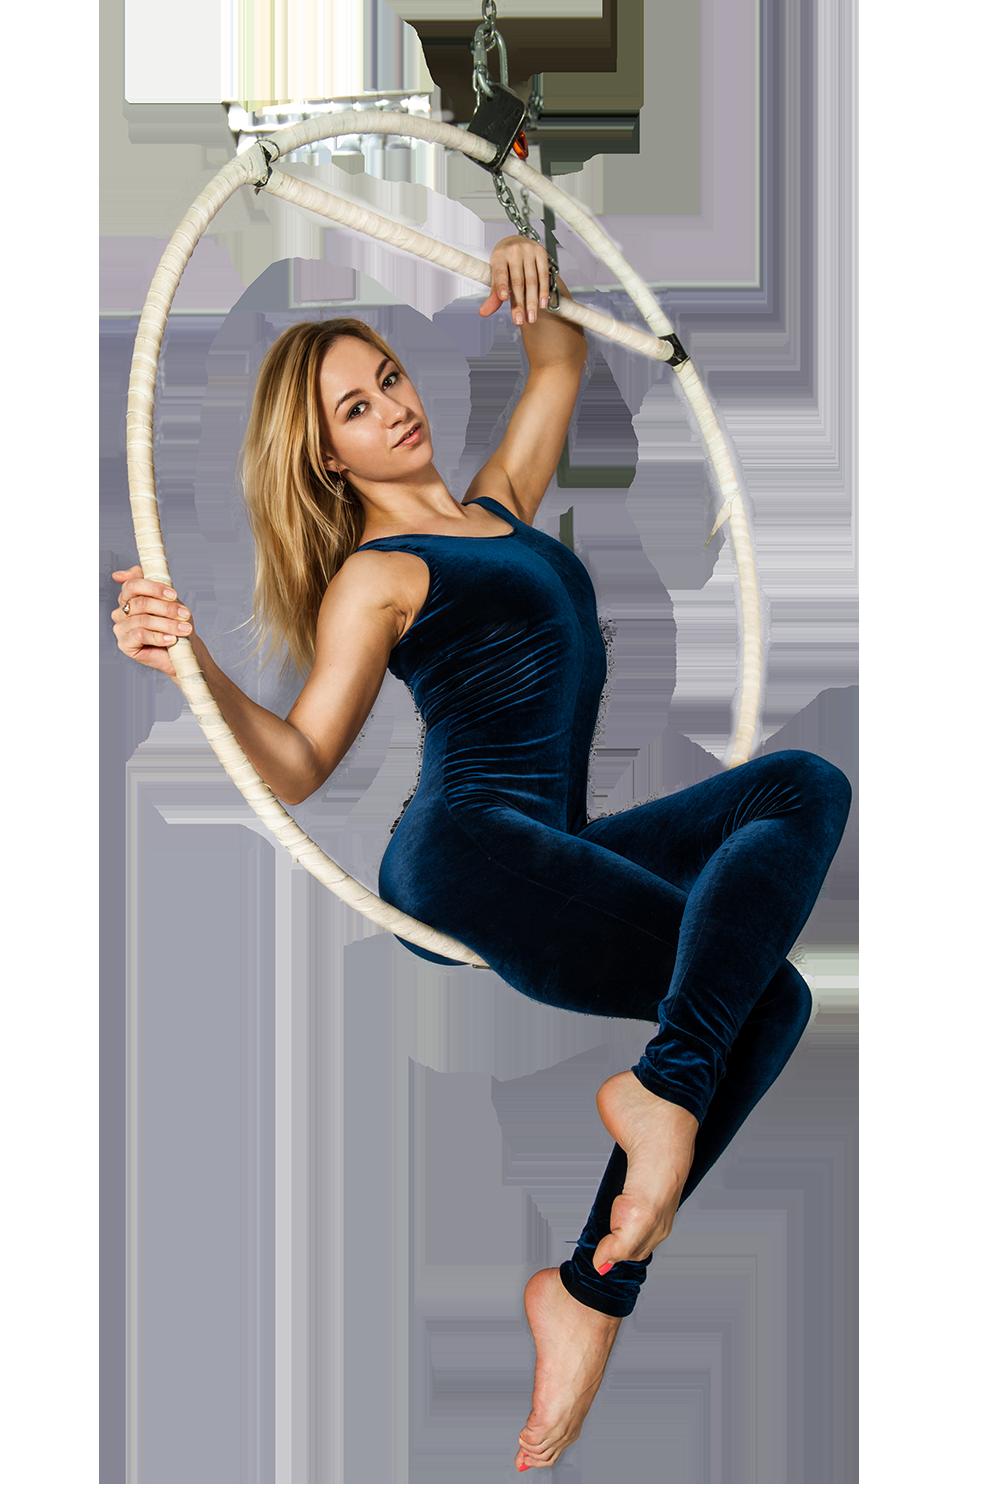 Воздушная гимнастика на кольце (Aerial ring)